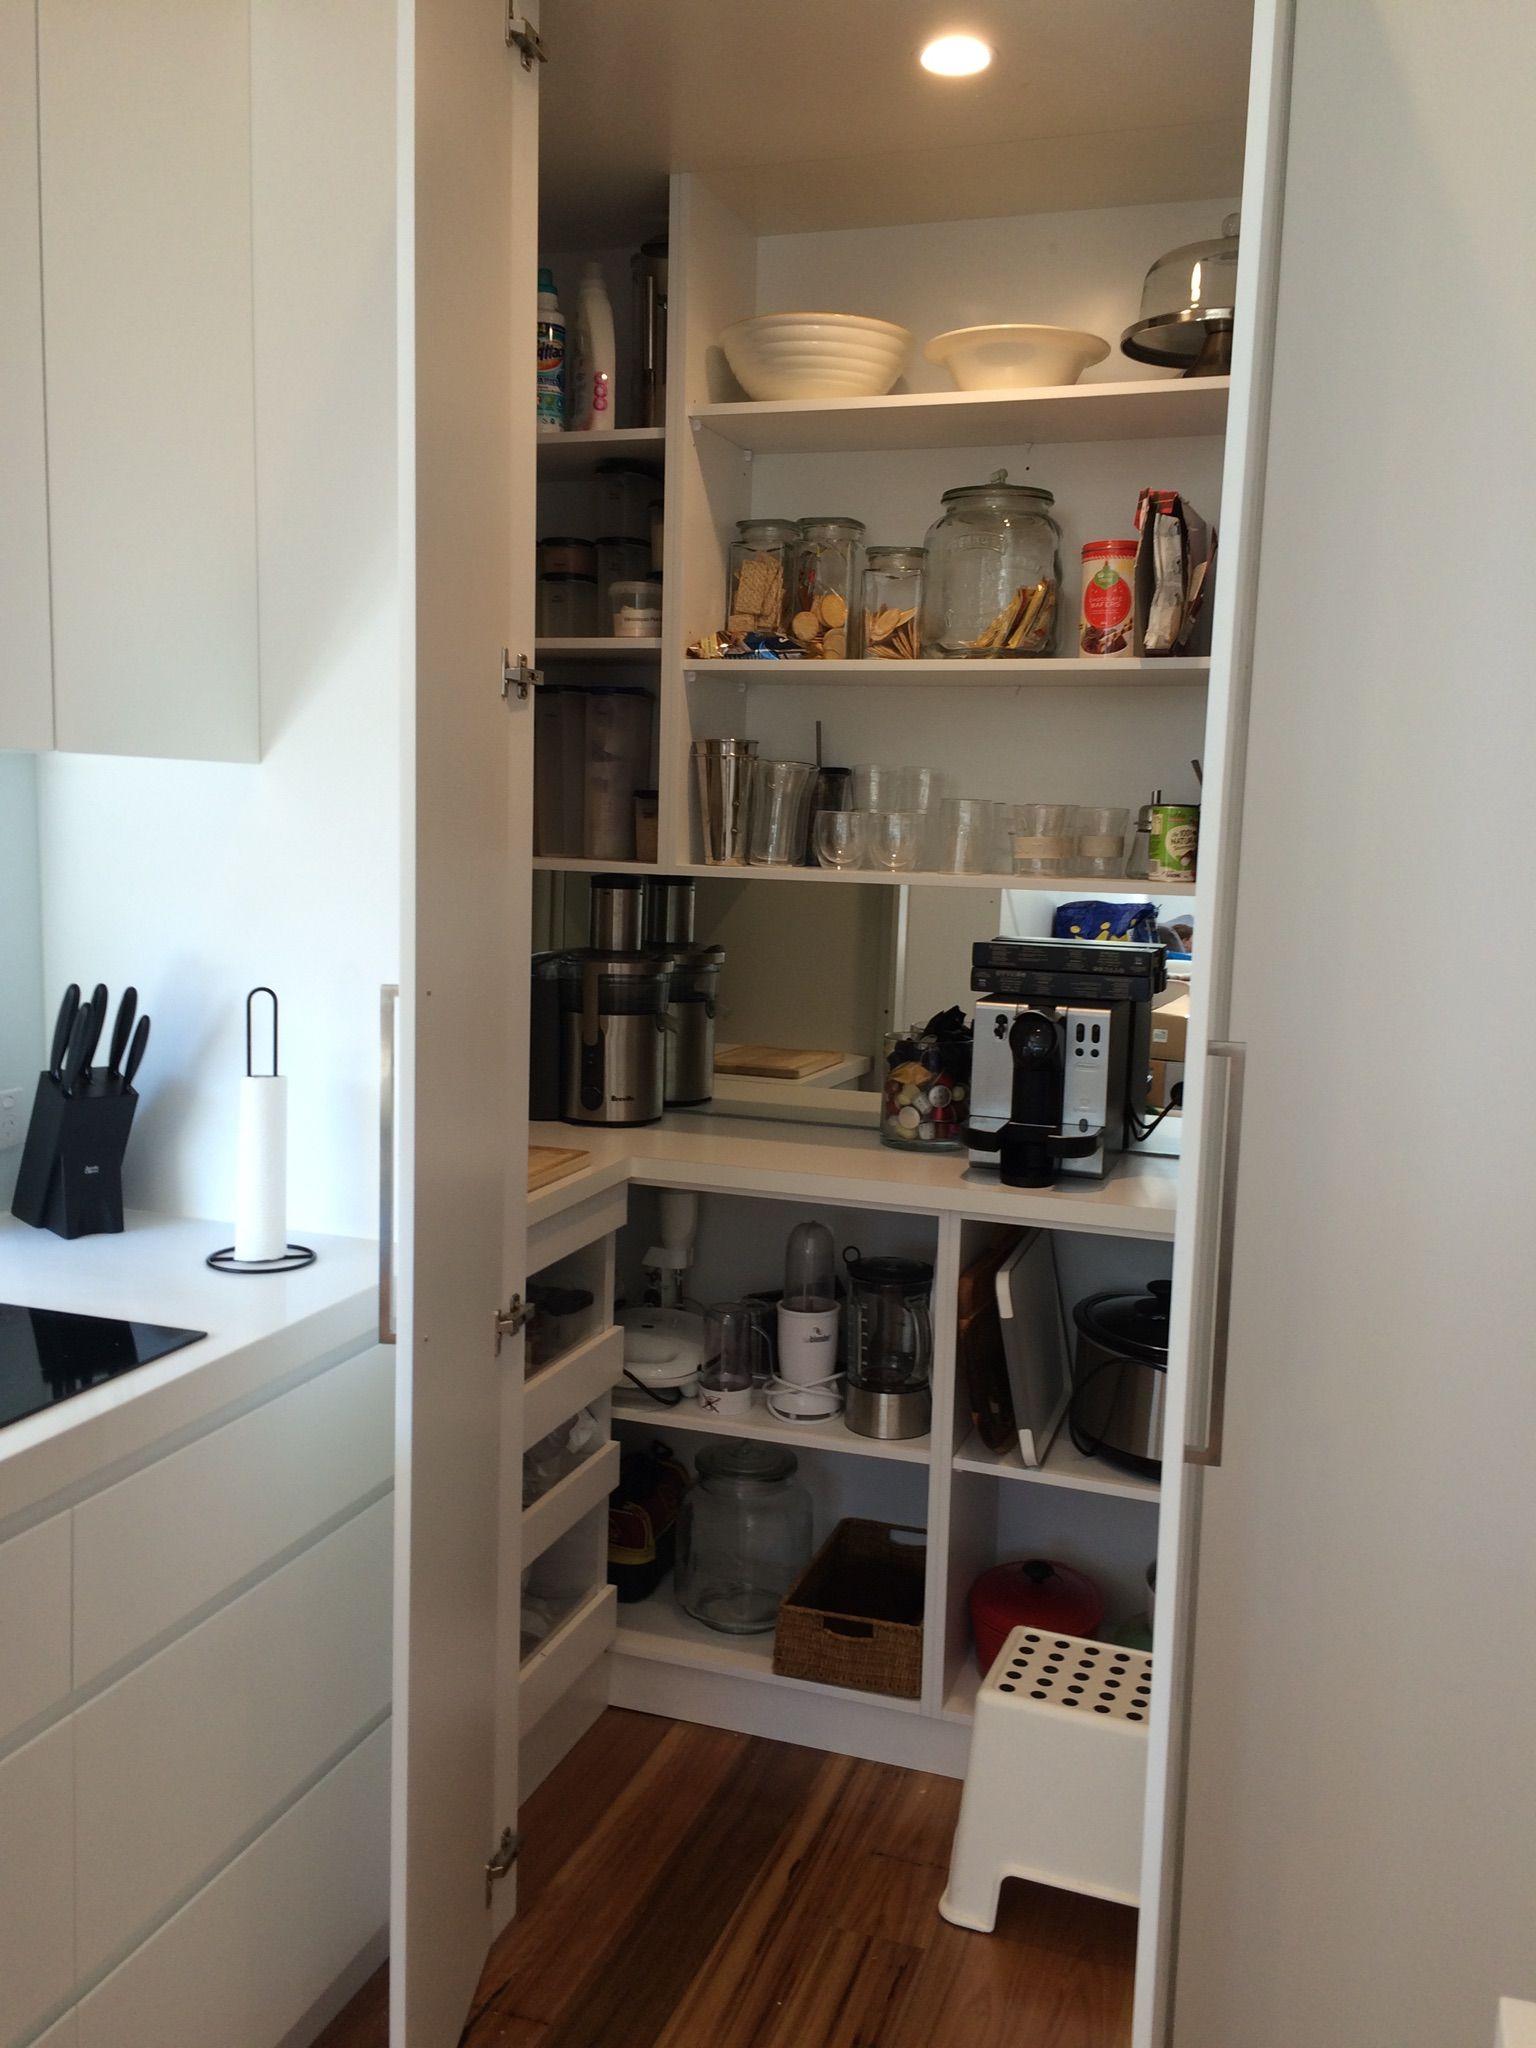 Corner Pantry But With Pocket Door Pantry Shelf For Appliances Kuche Einrichten Kuche Planen Ideen Kuche Planen